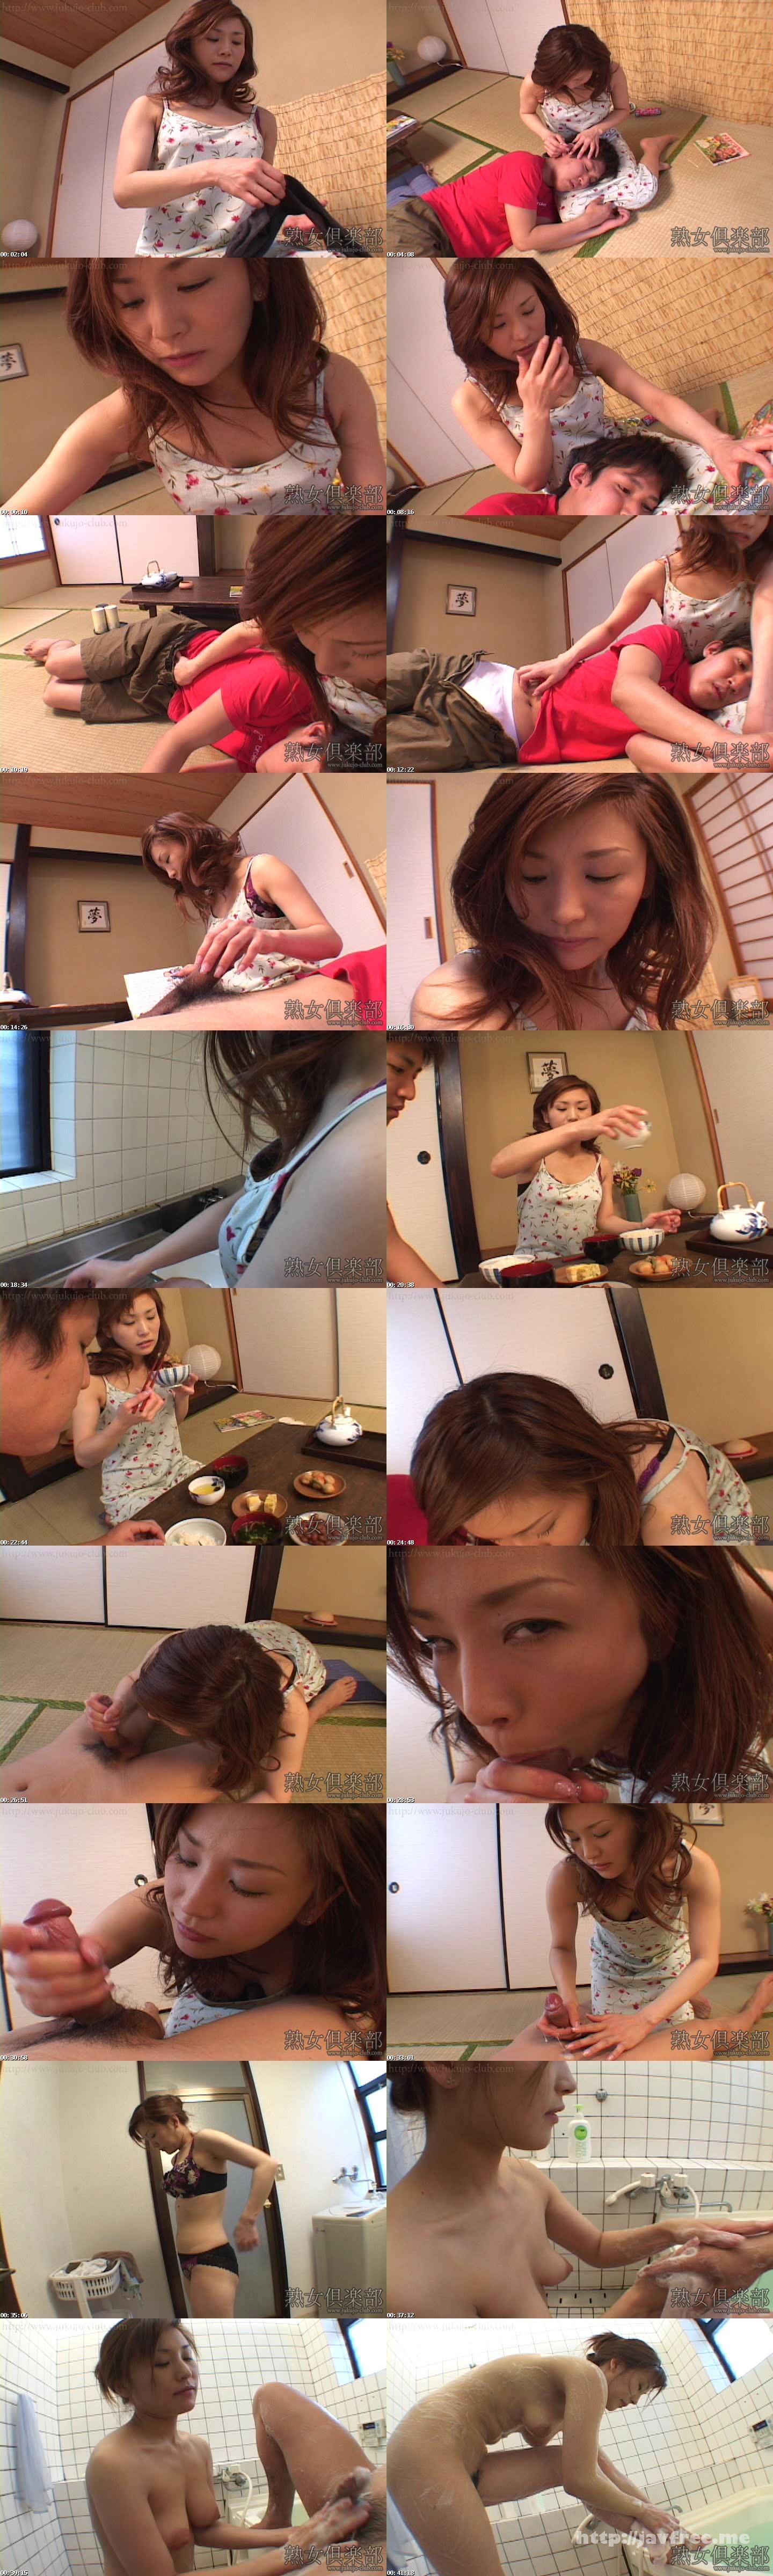 Jukujo club 5200 藤沢翔子 家族を愛して何が悪い?! 第1話   熟女倶楽部 藤沢翔子 熟女倶楽部 Jukujo club